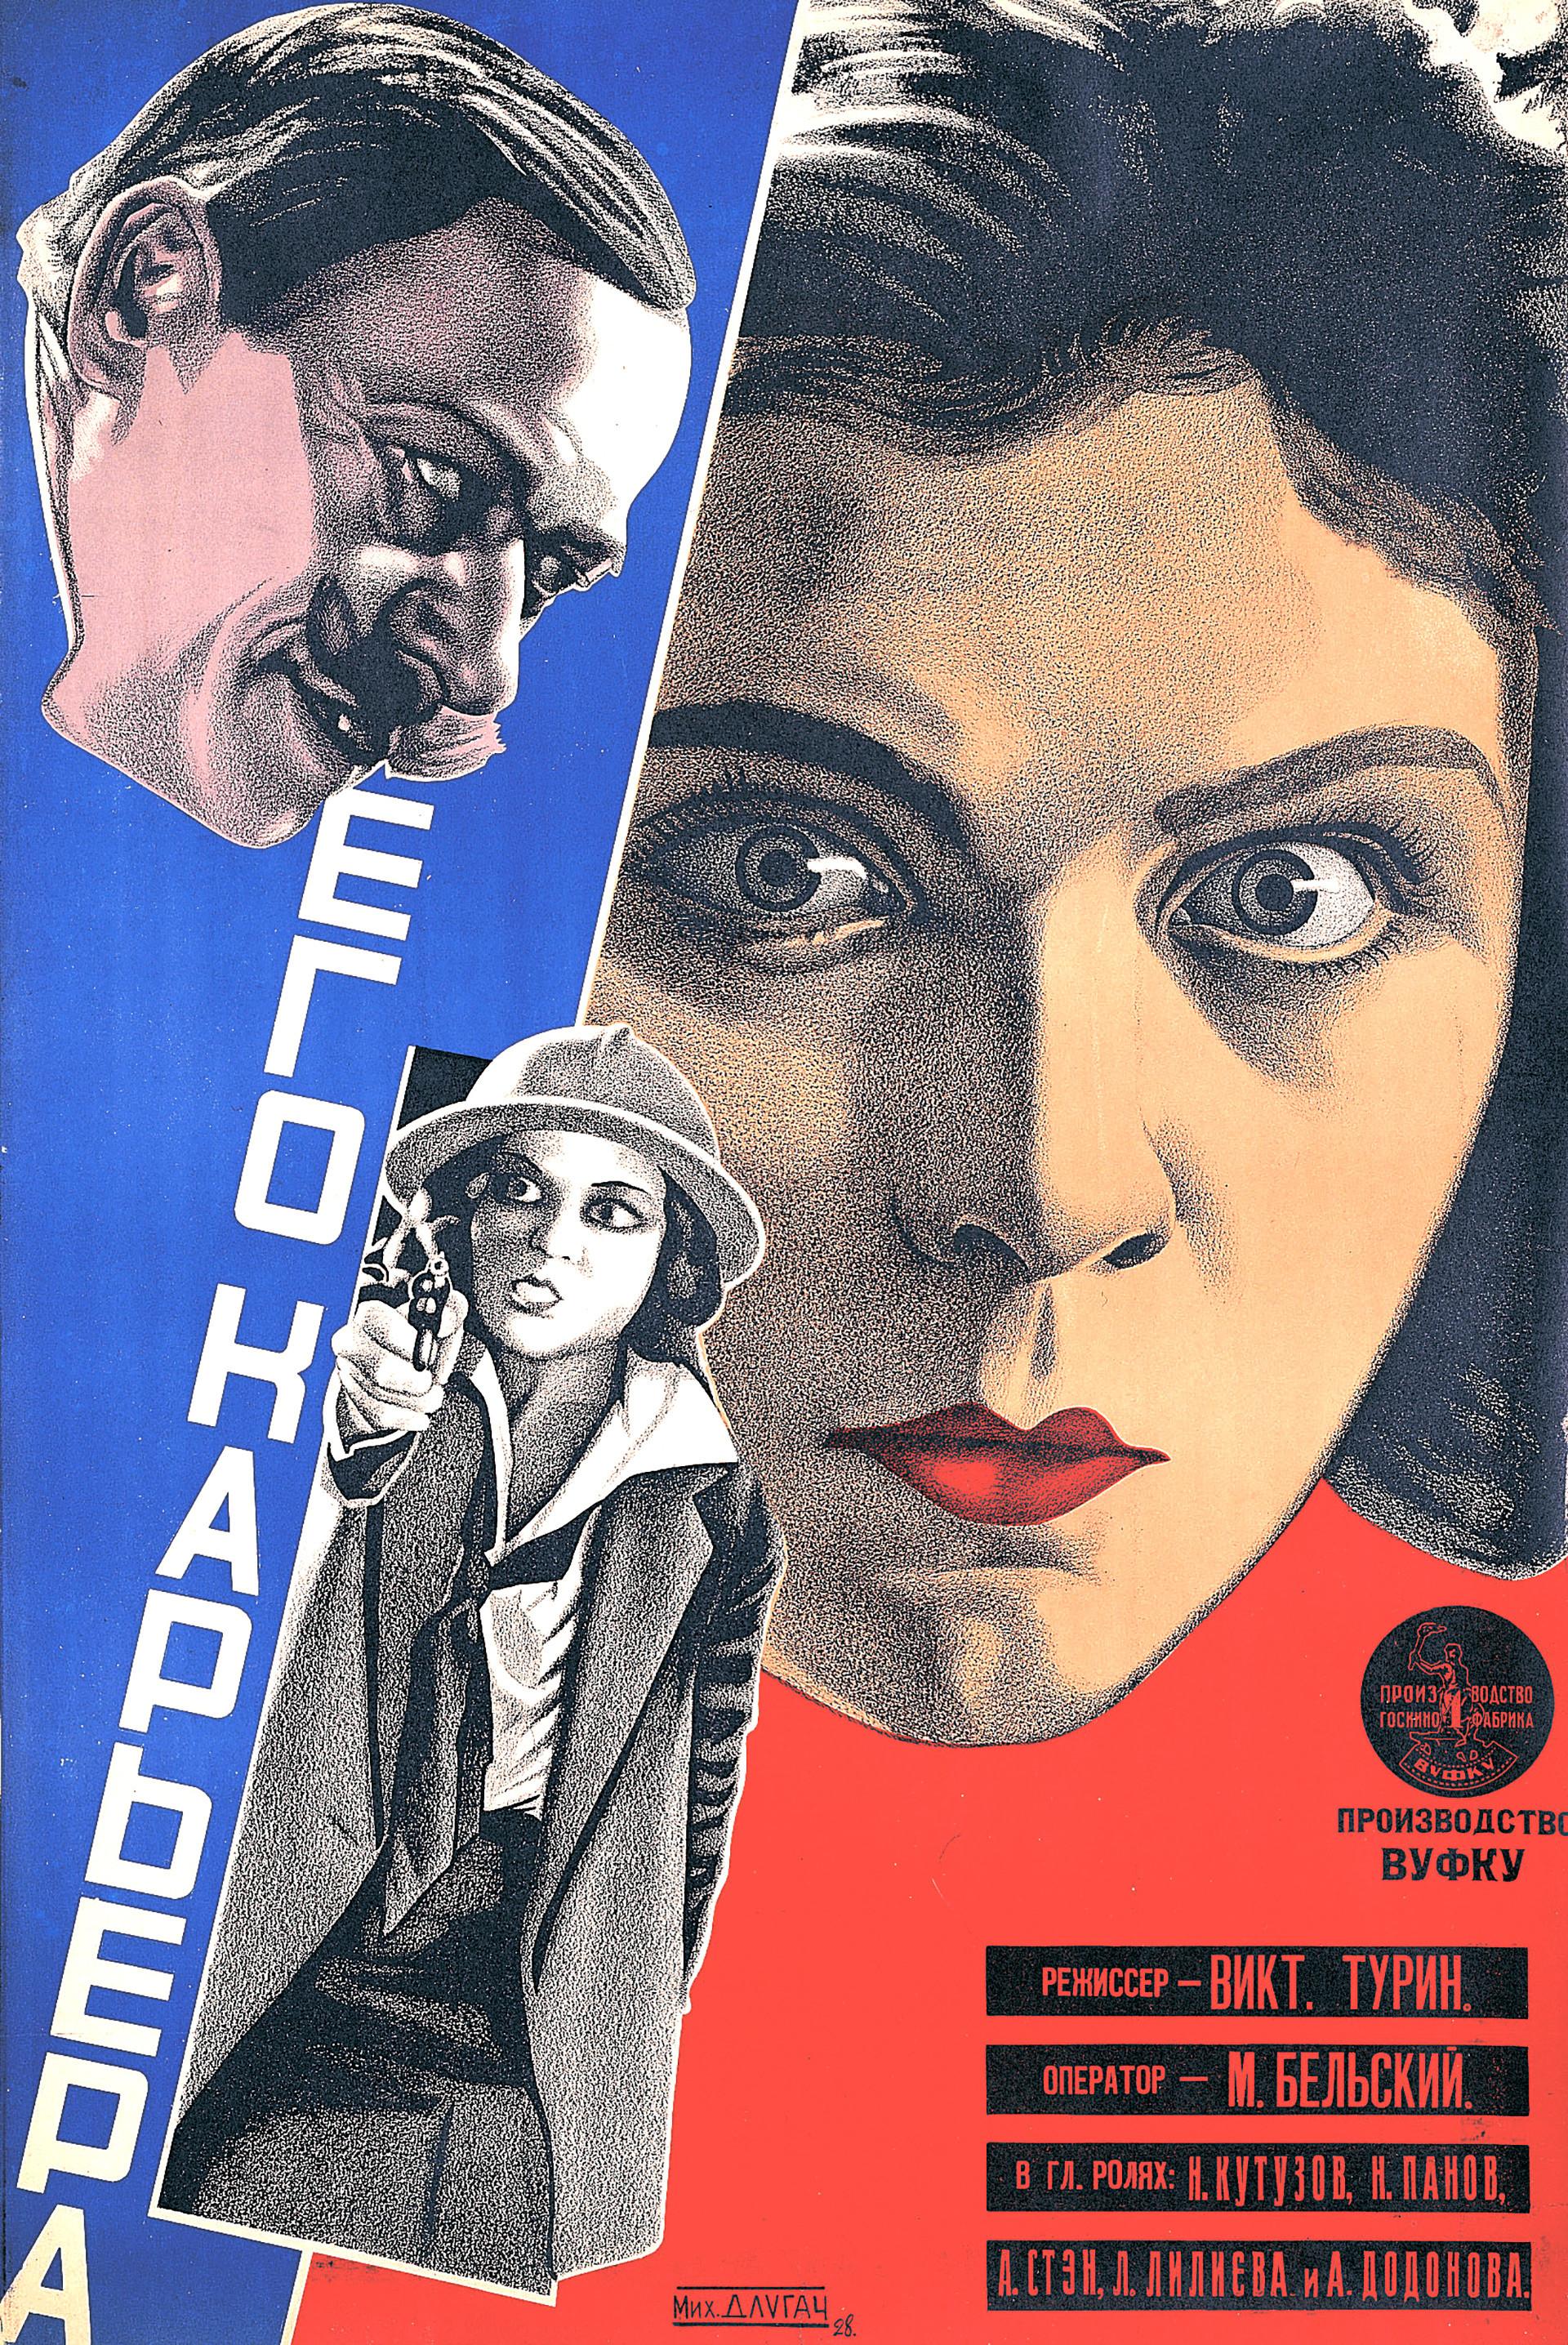 Mikhail Dlugach, poster cinematografico di Yego Kariera, 1928